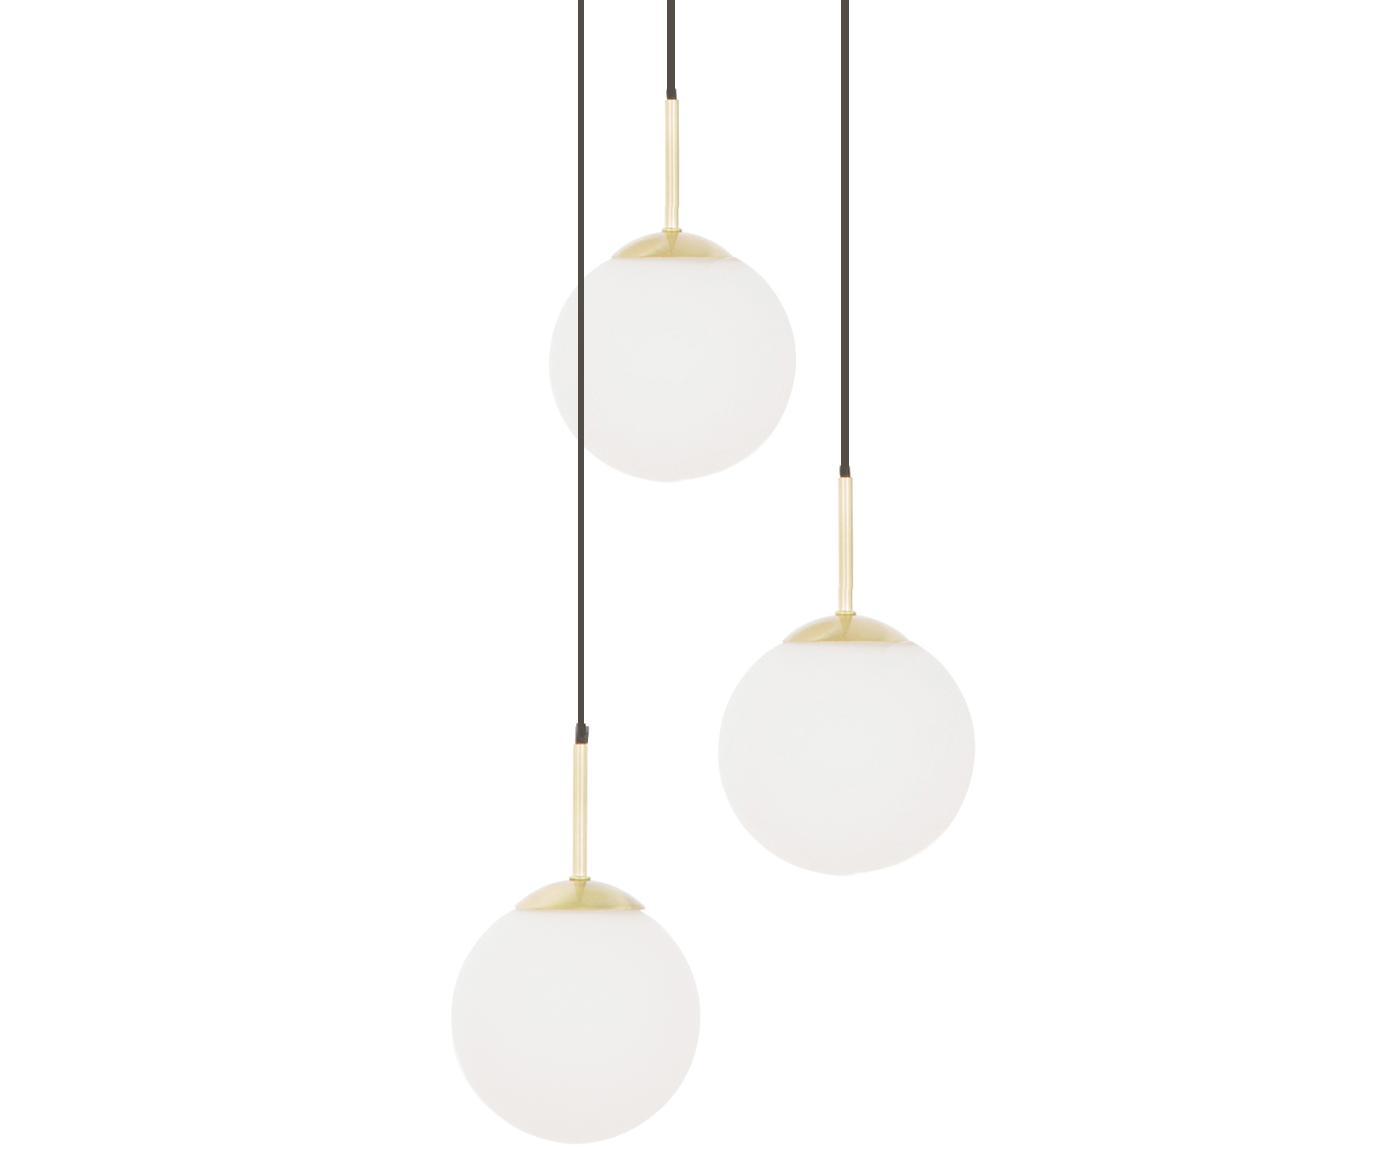 Lampada a sospensione in vetro Edie, Paralume: vetro, Bianco, ottone, Ø 30 cm